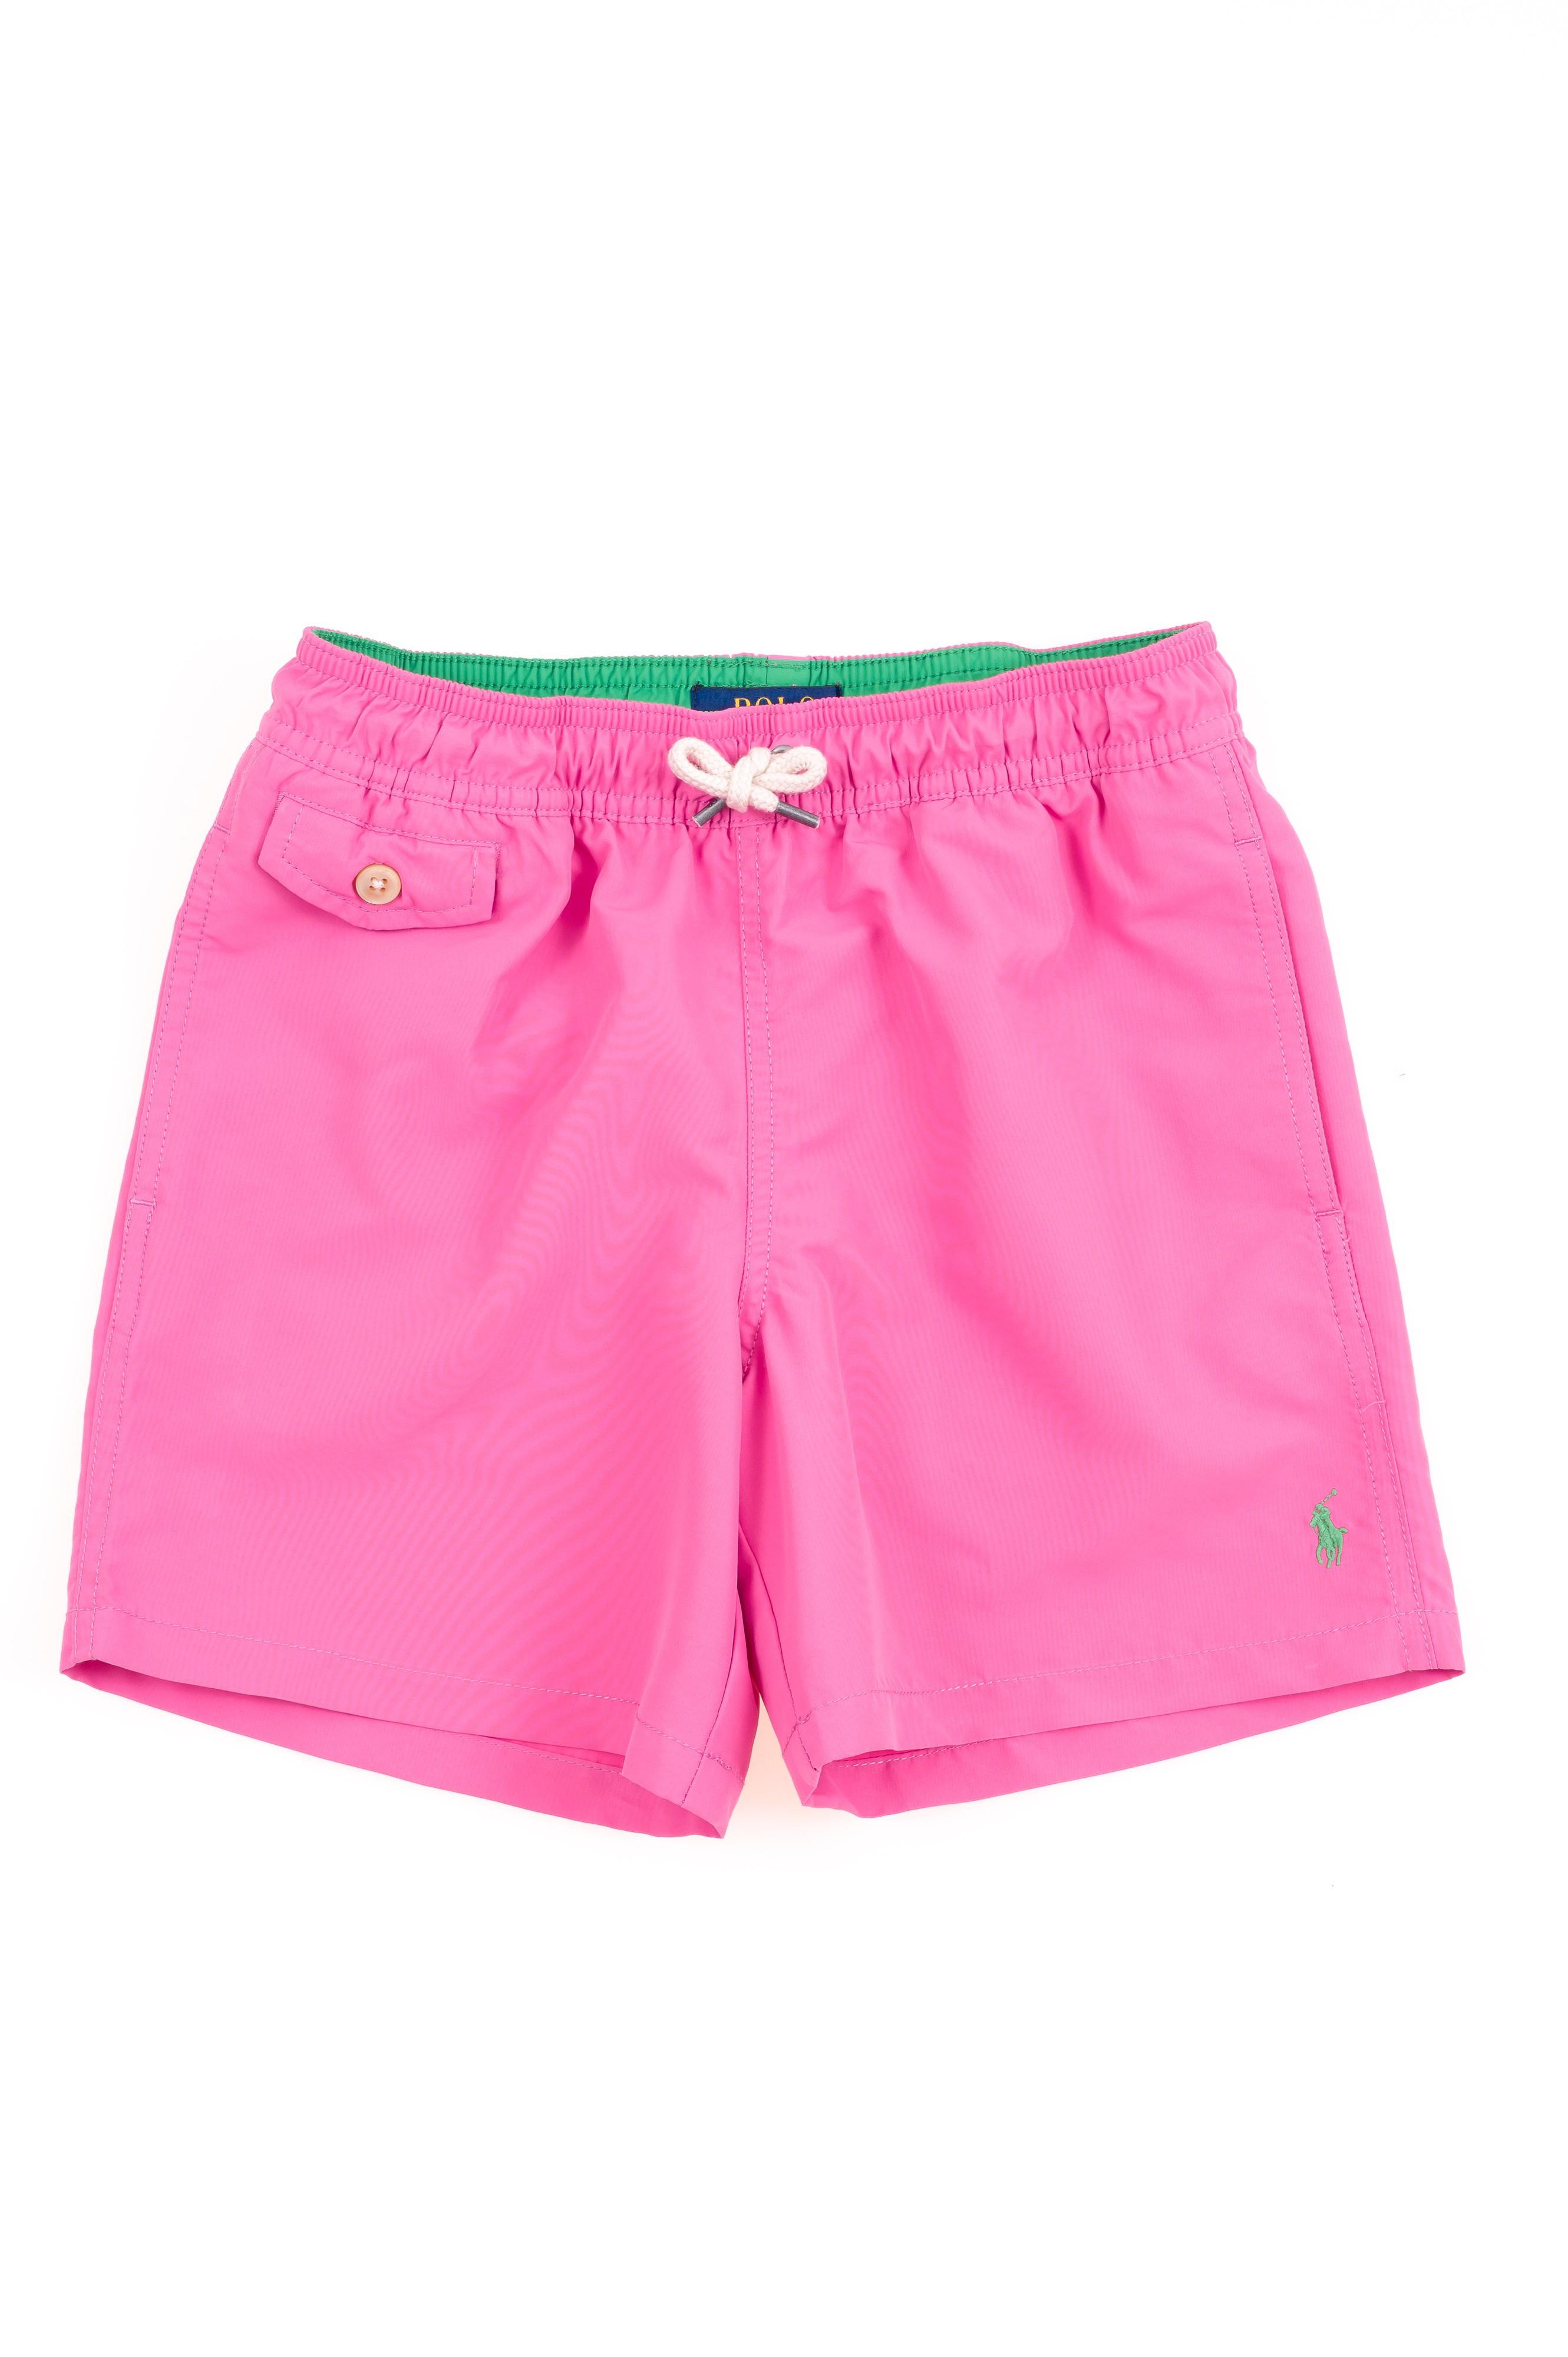 Boys Ralph Lauren Celebrity Pink Swim ShortsPolo Club shrQtdCx